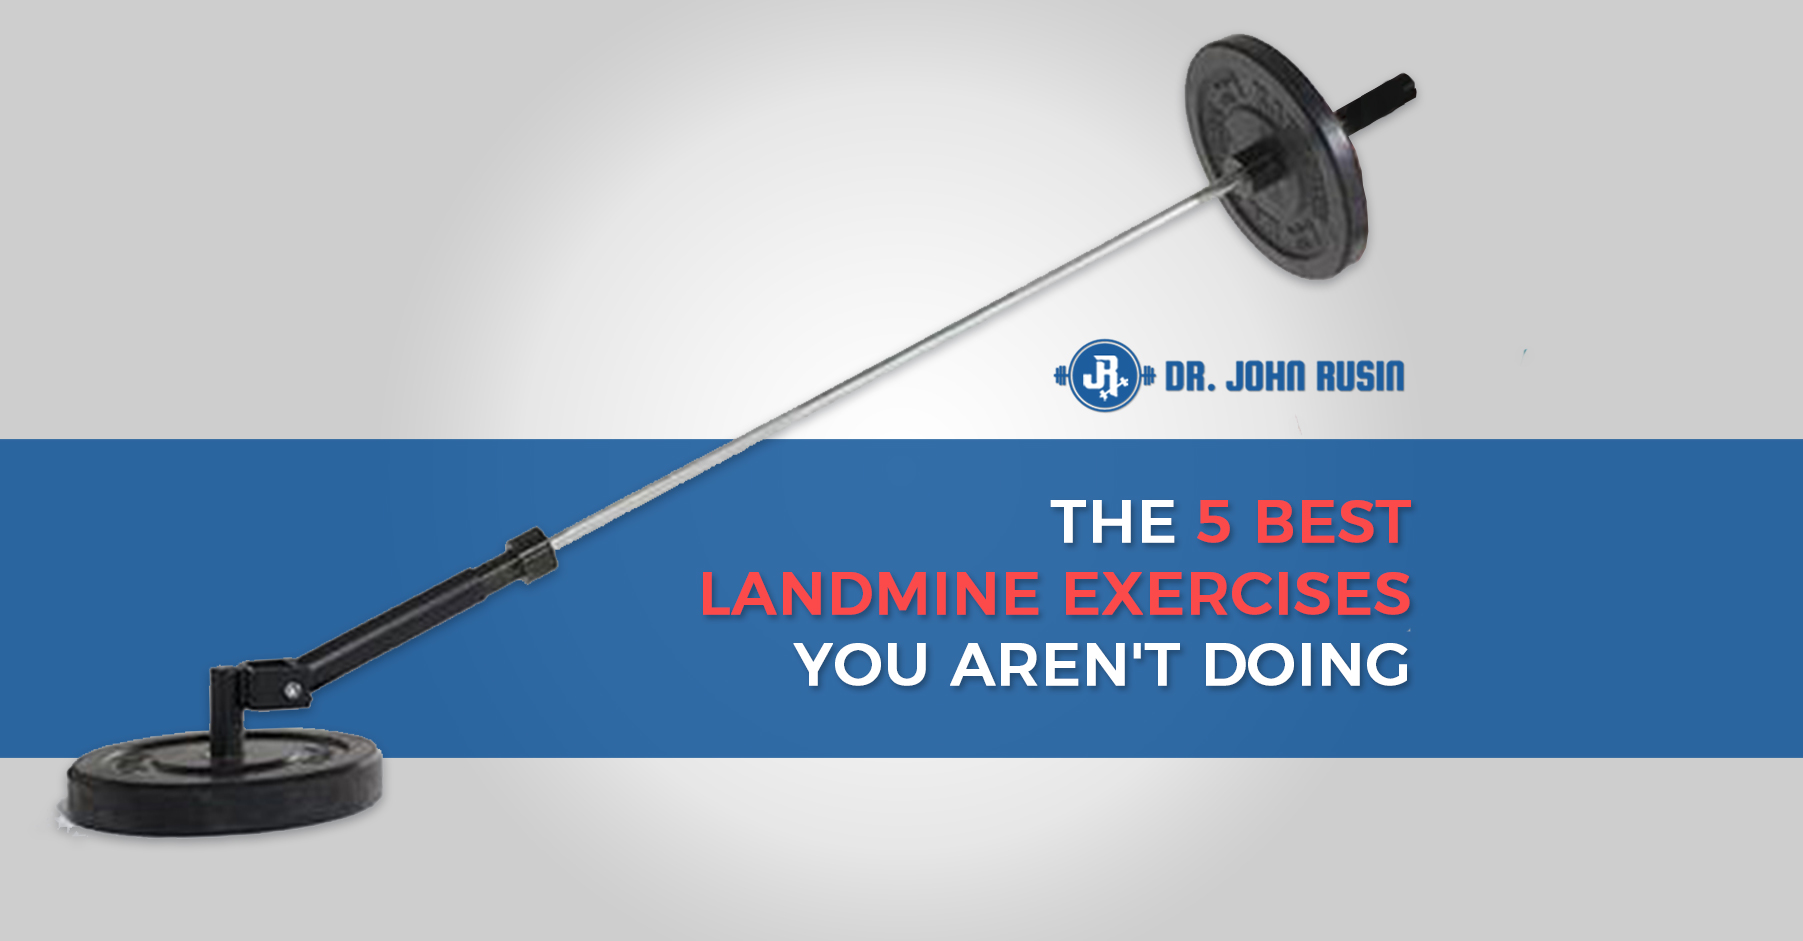 The 5 Best Landmine Exercises You Arent Doing  DrJohnRusincom